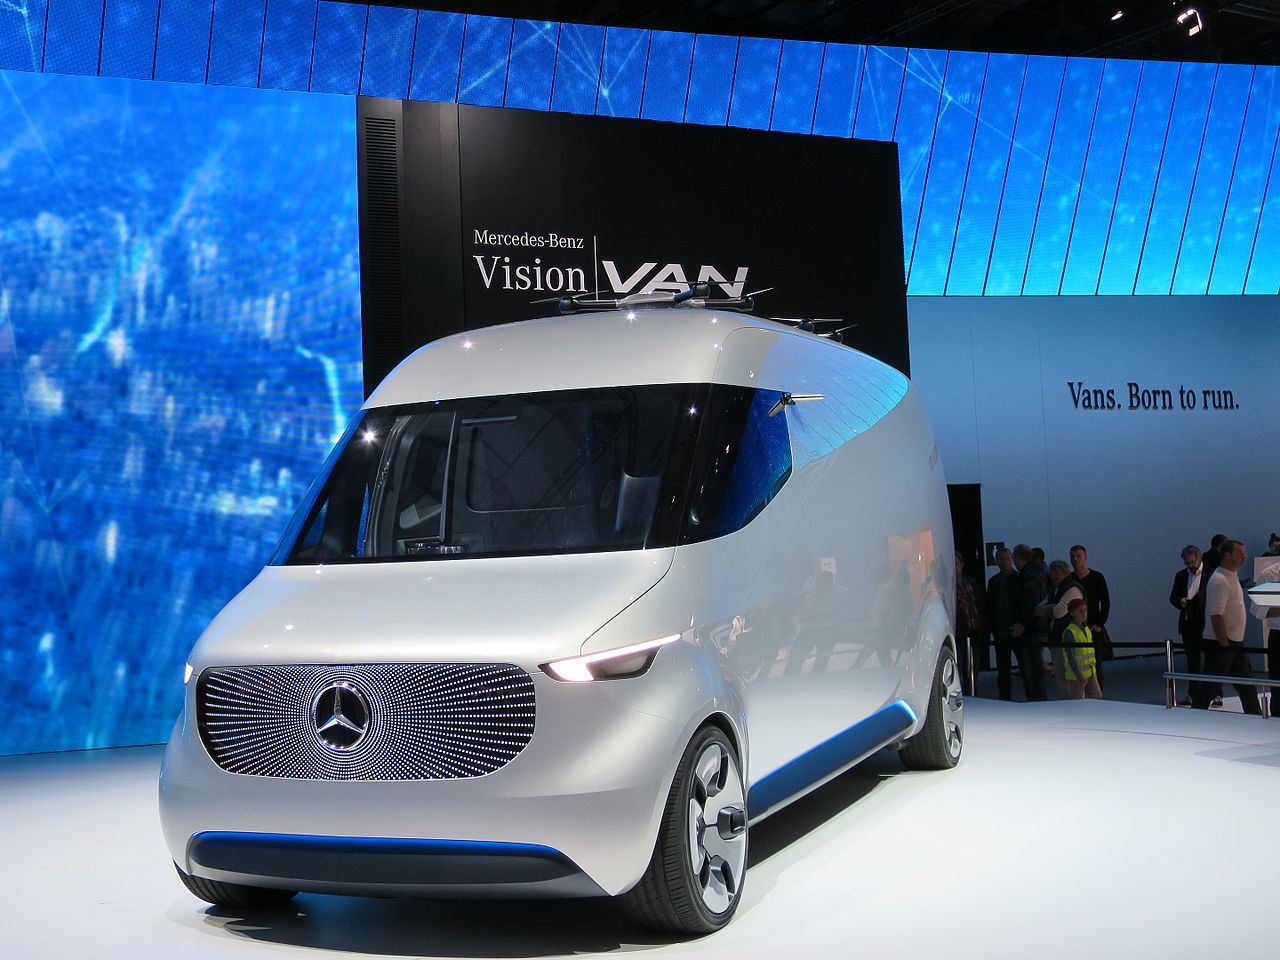 File:Mercedes-Benz Vision VAN IAA 2016 (1) Travelarz.JPG - Wikimedia ...